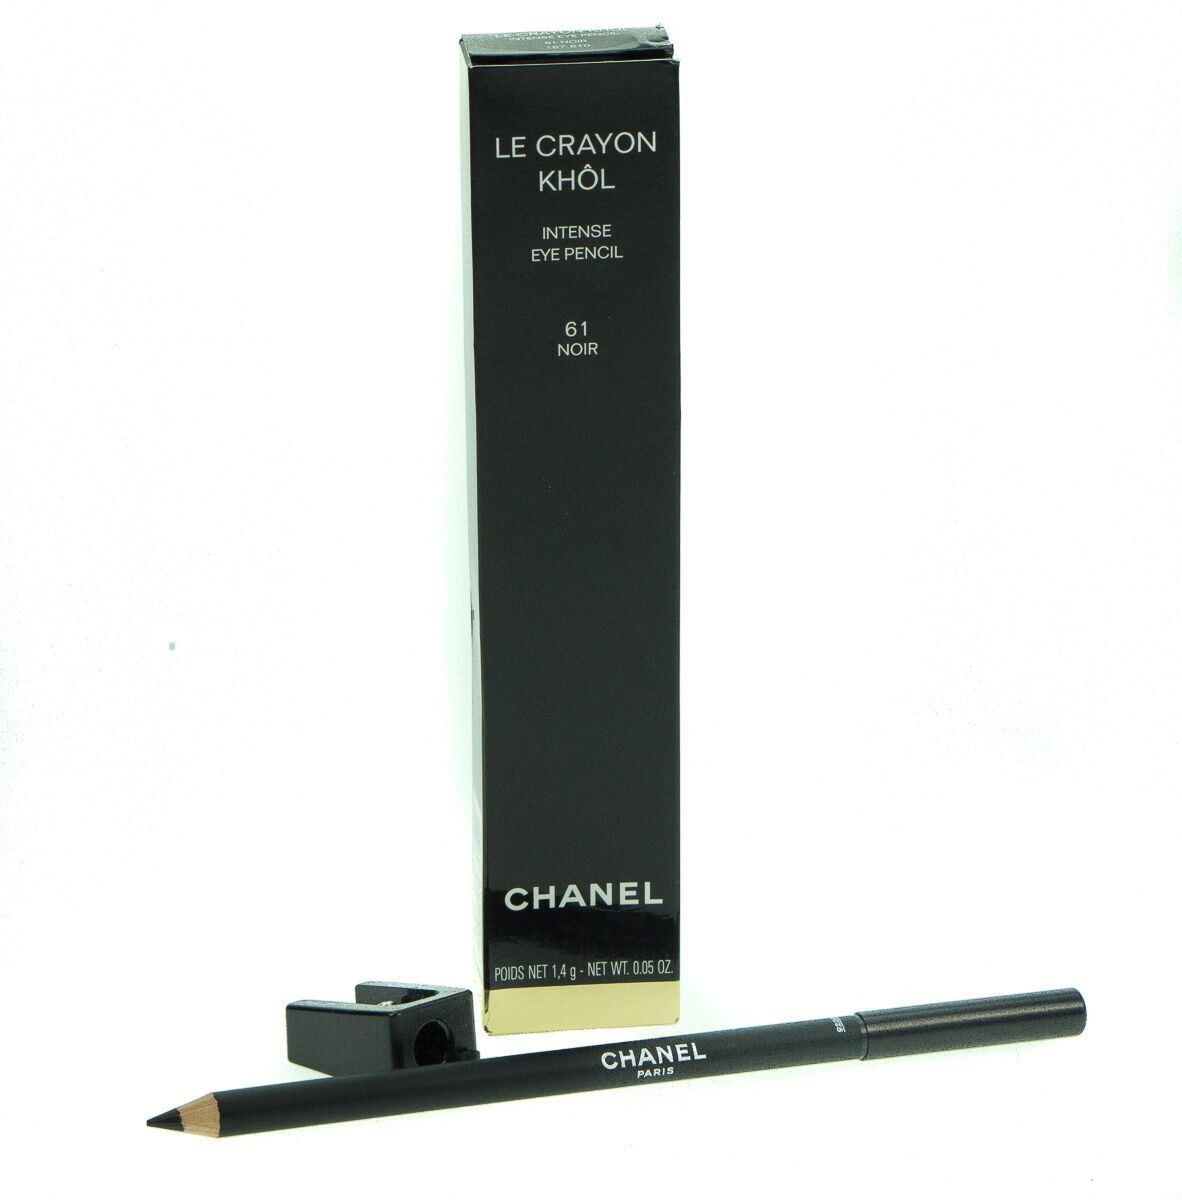 Details about Chanel Le Crayon Khol Intense Eye Liner Noir No.61 1.4g For  Women